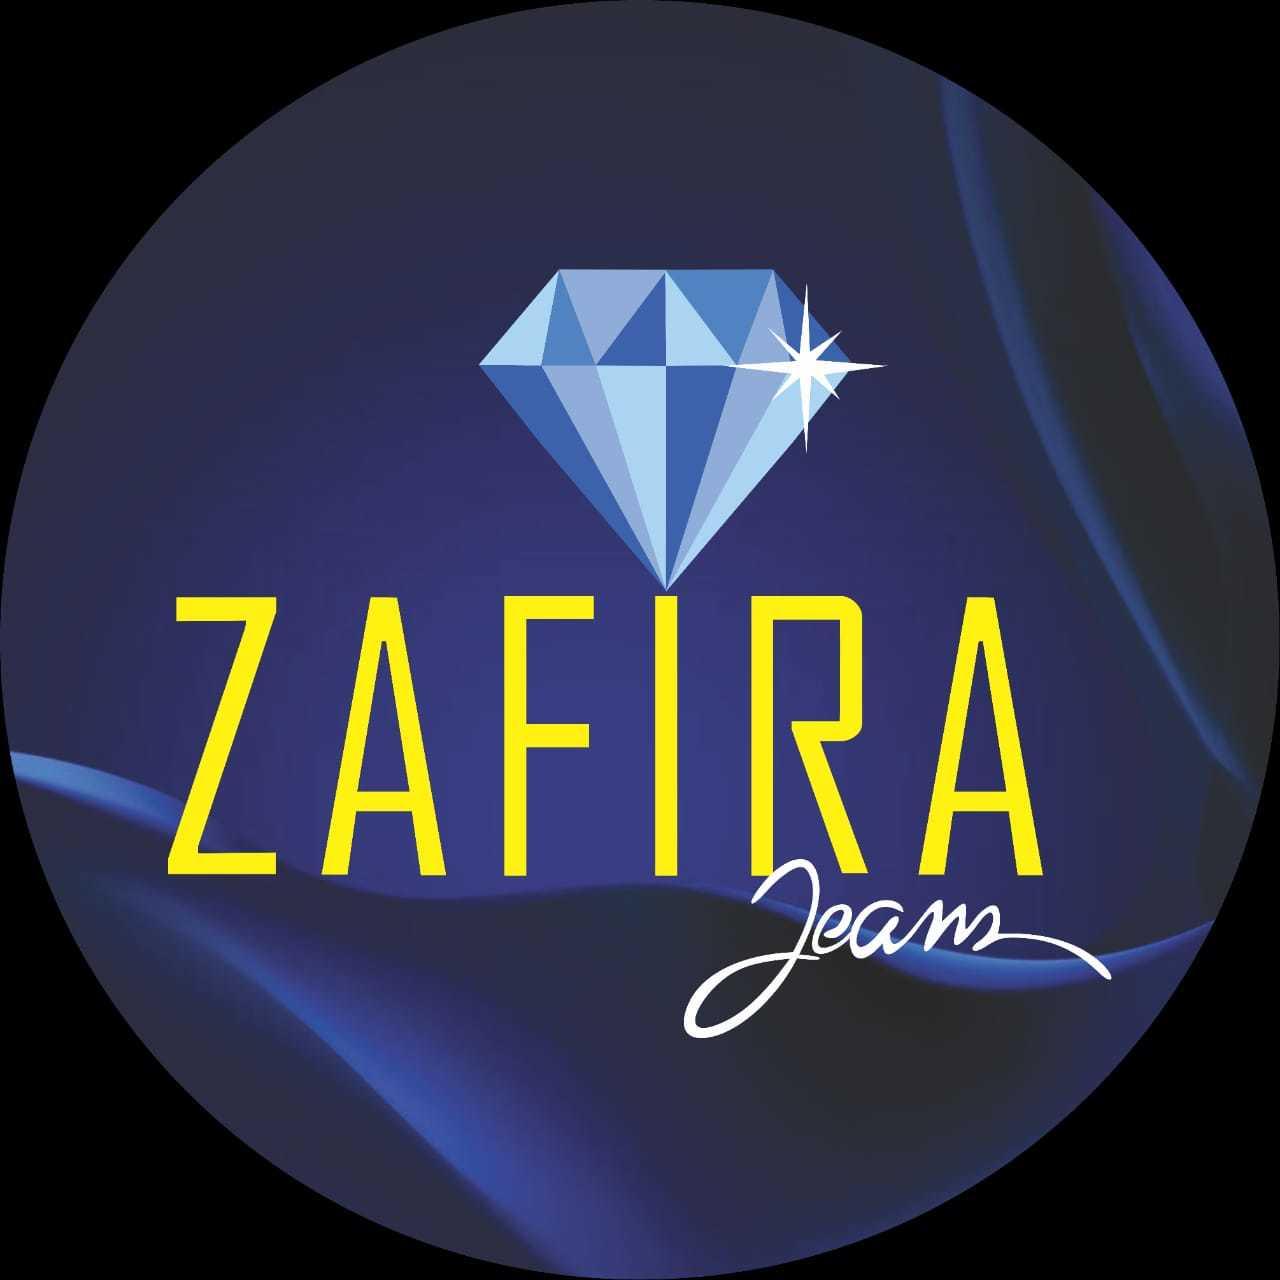 ZAFIRA JEANS